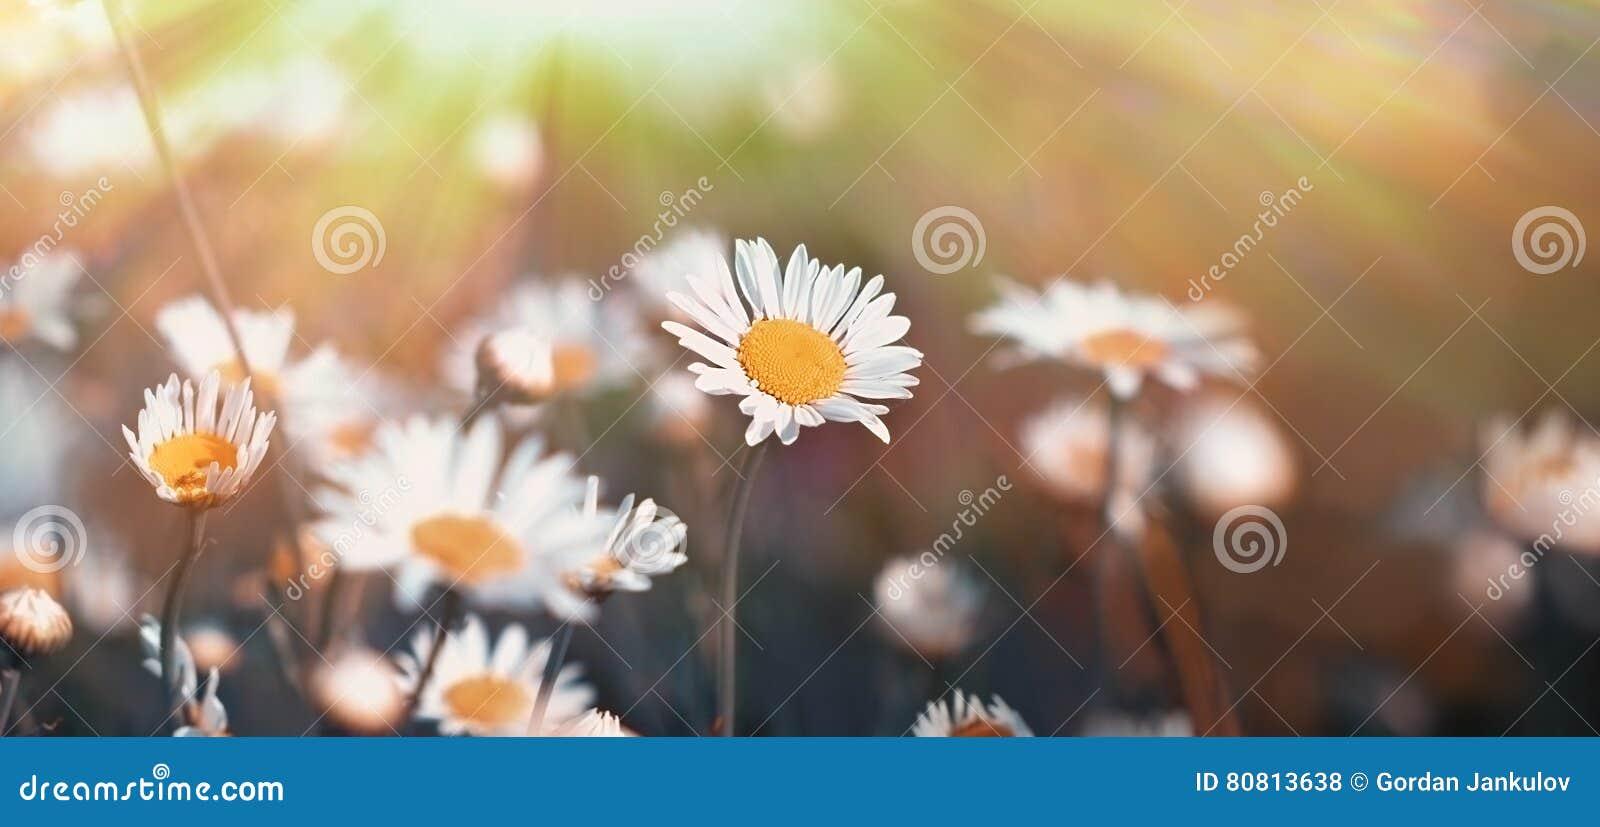 Beautiful daisy flowers lit by sun rays stock photo image of fresh beautiful daisy flowers lit by sun rays izmirmasajfo